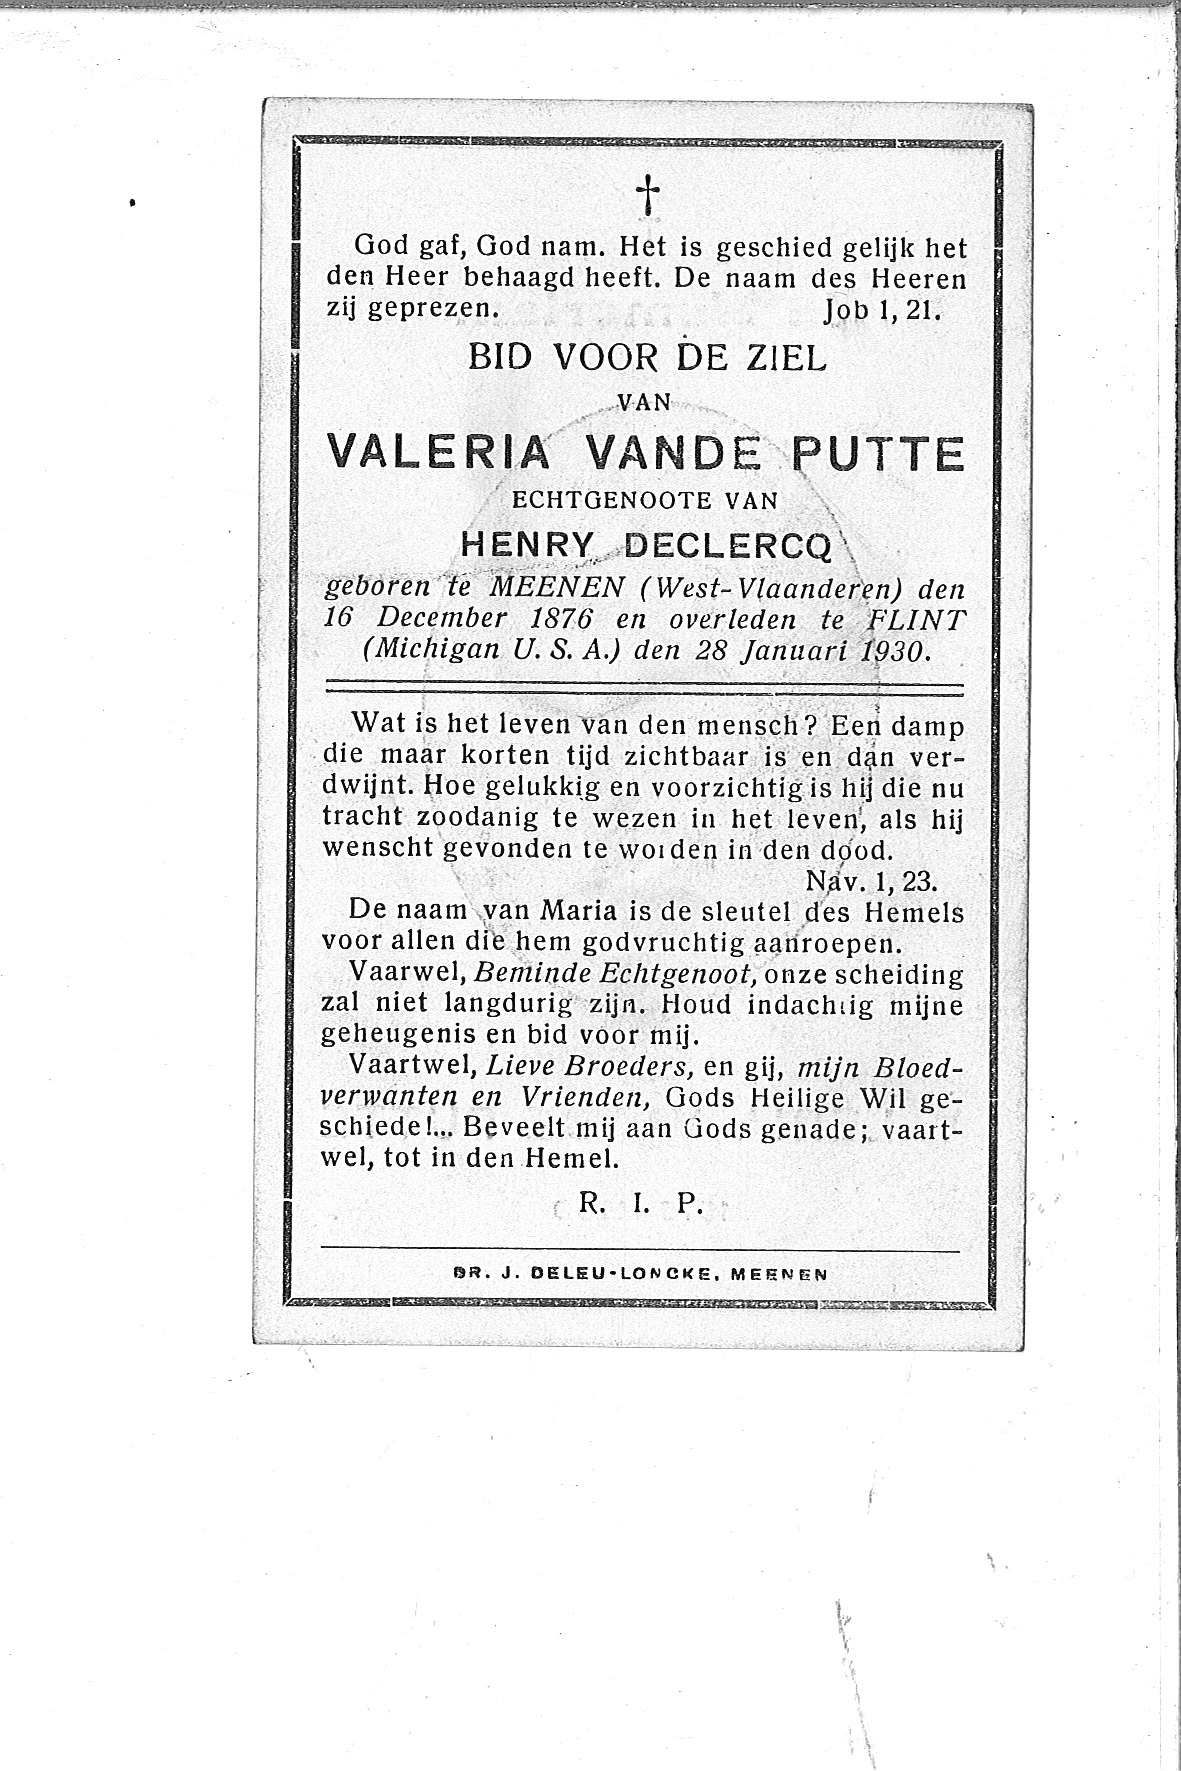 Valeria(1930)20131023134903_00286.jpg